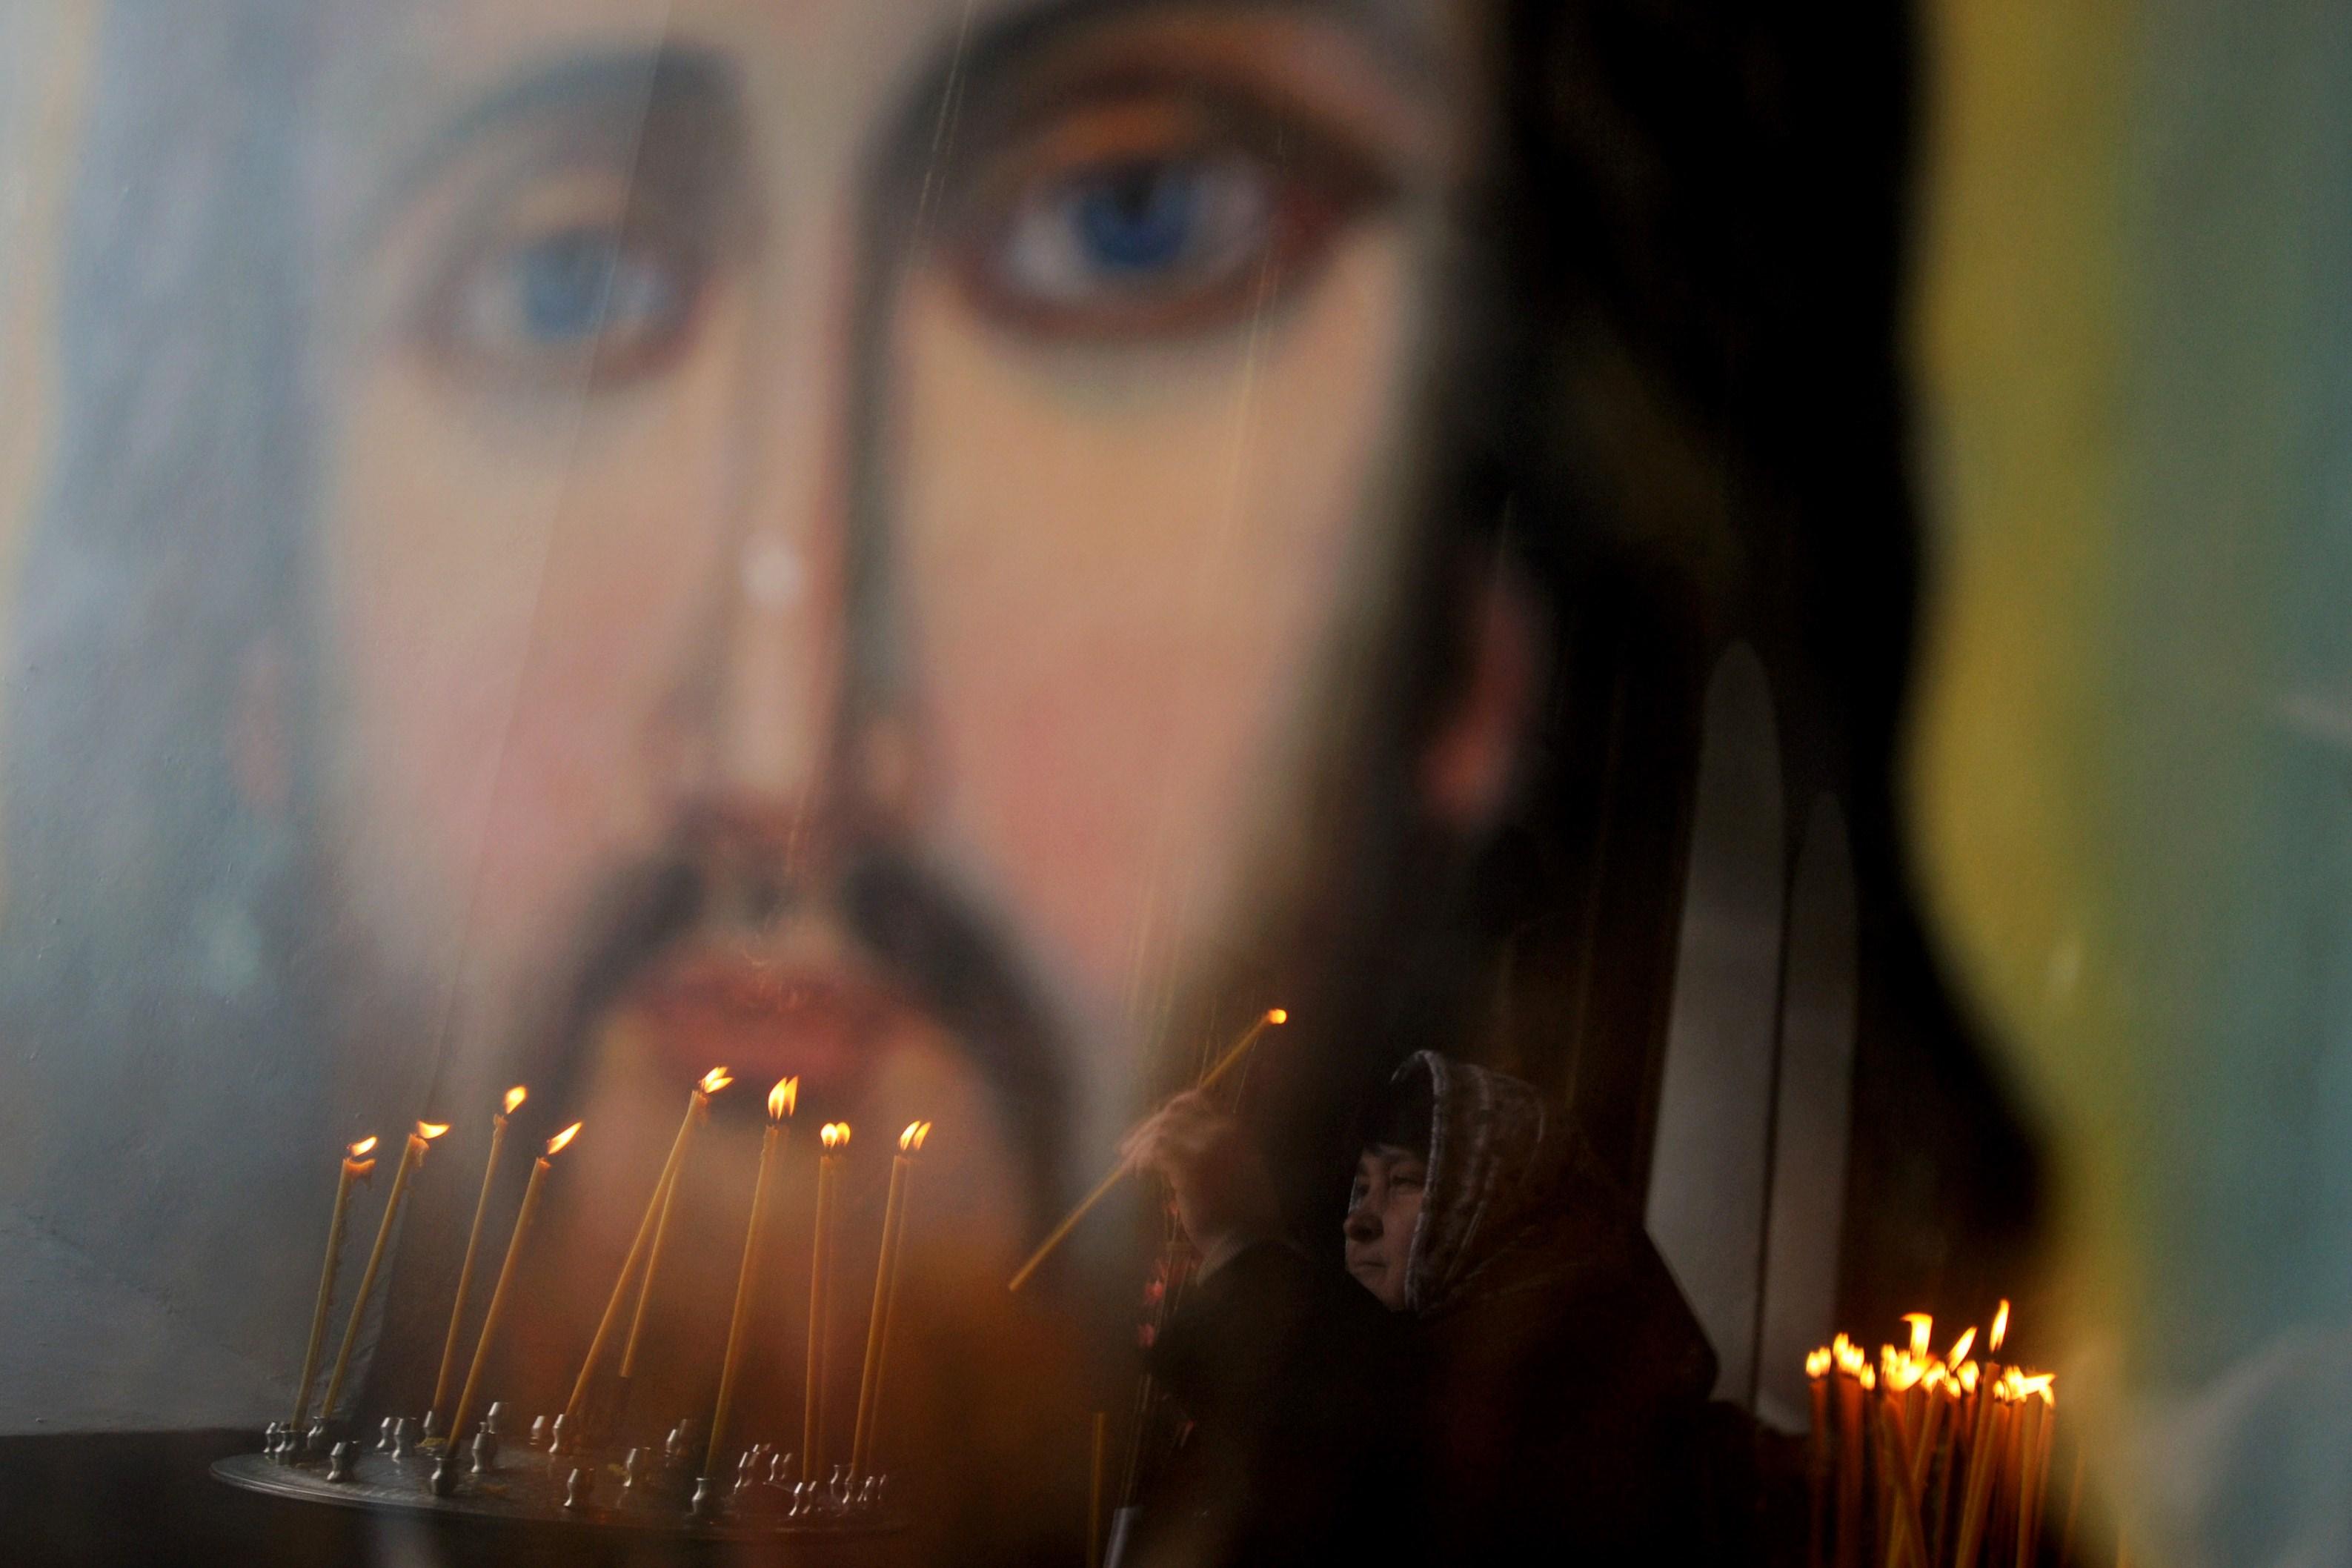 Viral: Jesus-Bild aus forensischer Forschung rekonstruiert